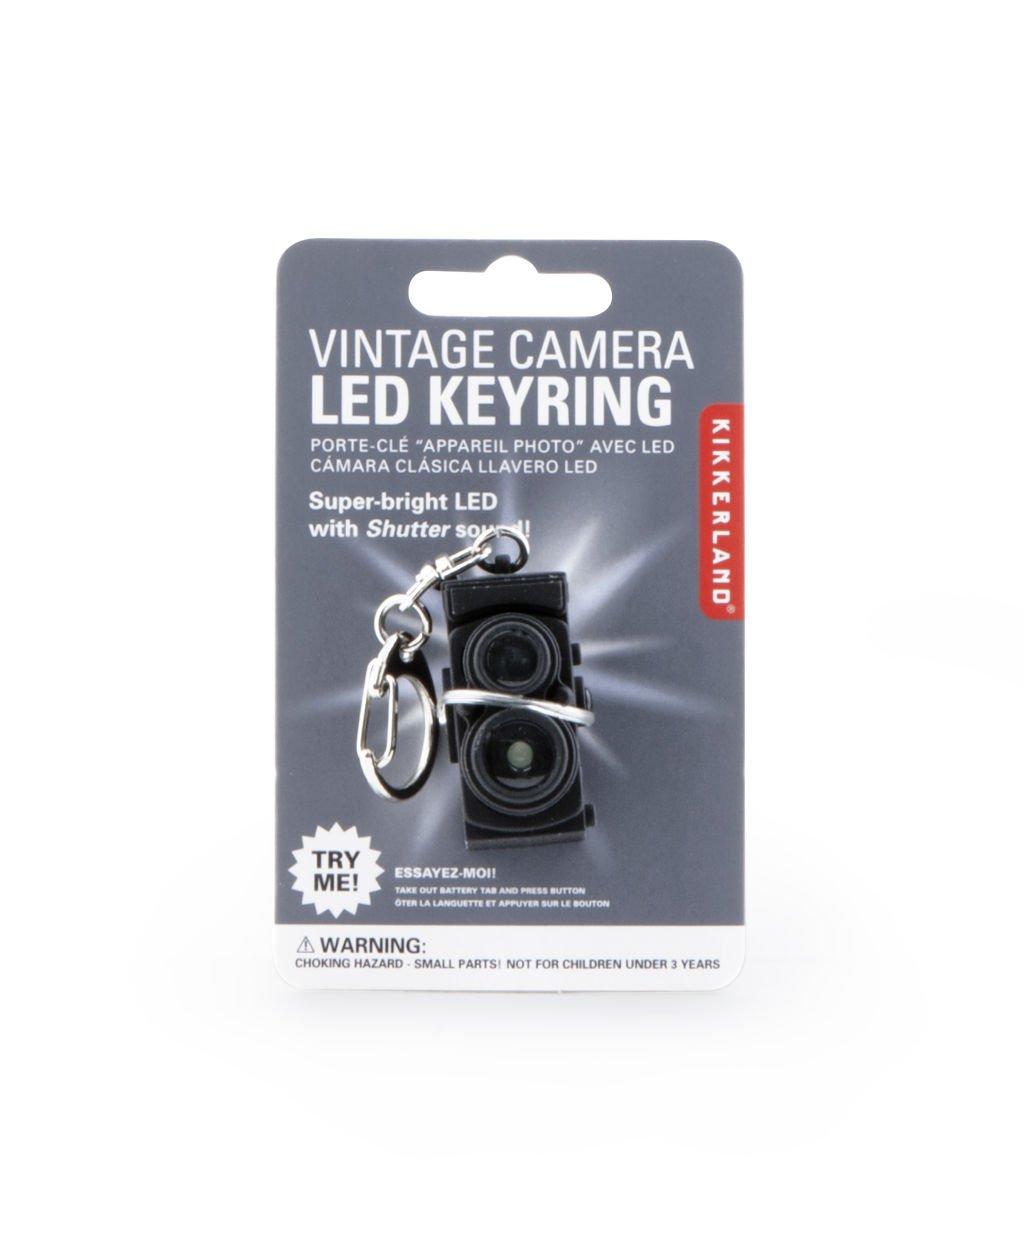 Kikkerland KRL24-CDU Vintage Camera LED Keychain - - Amazon.com